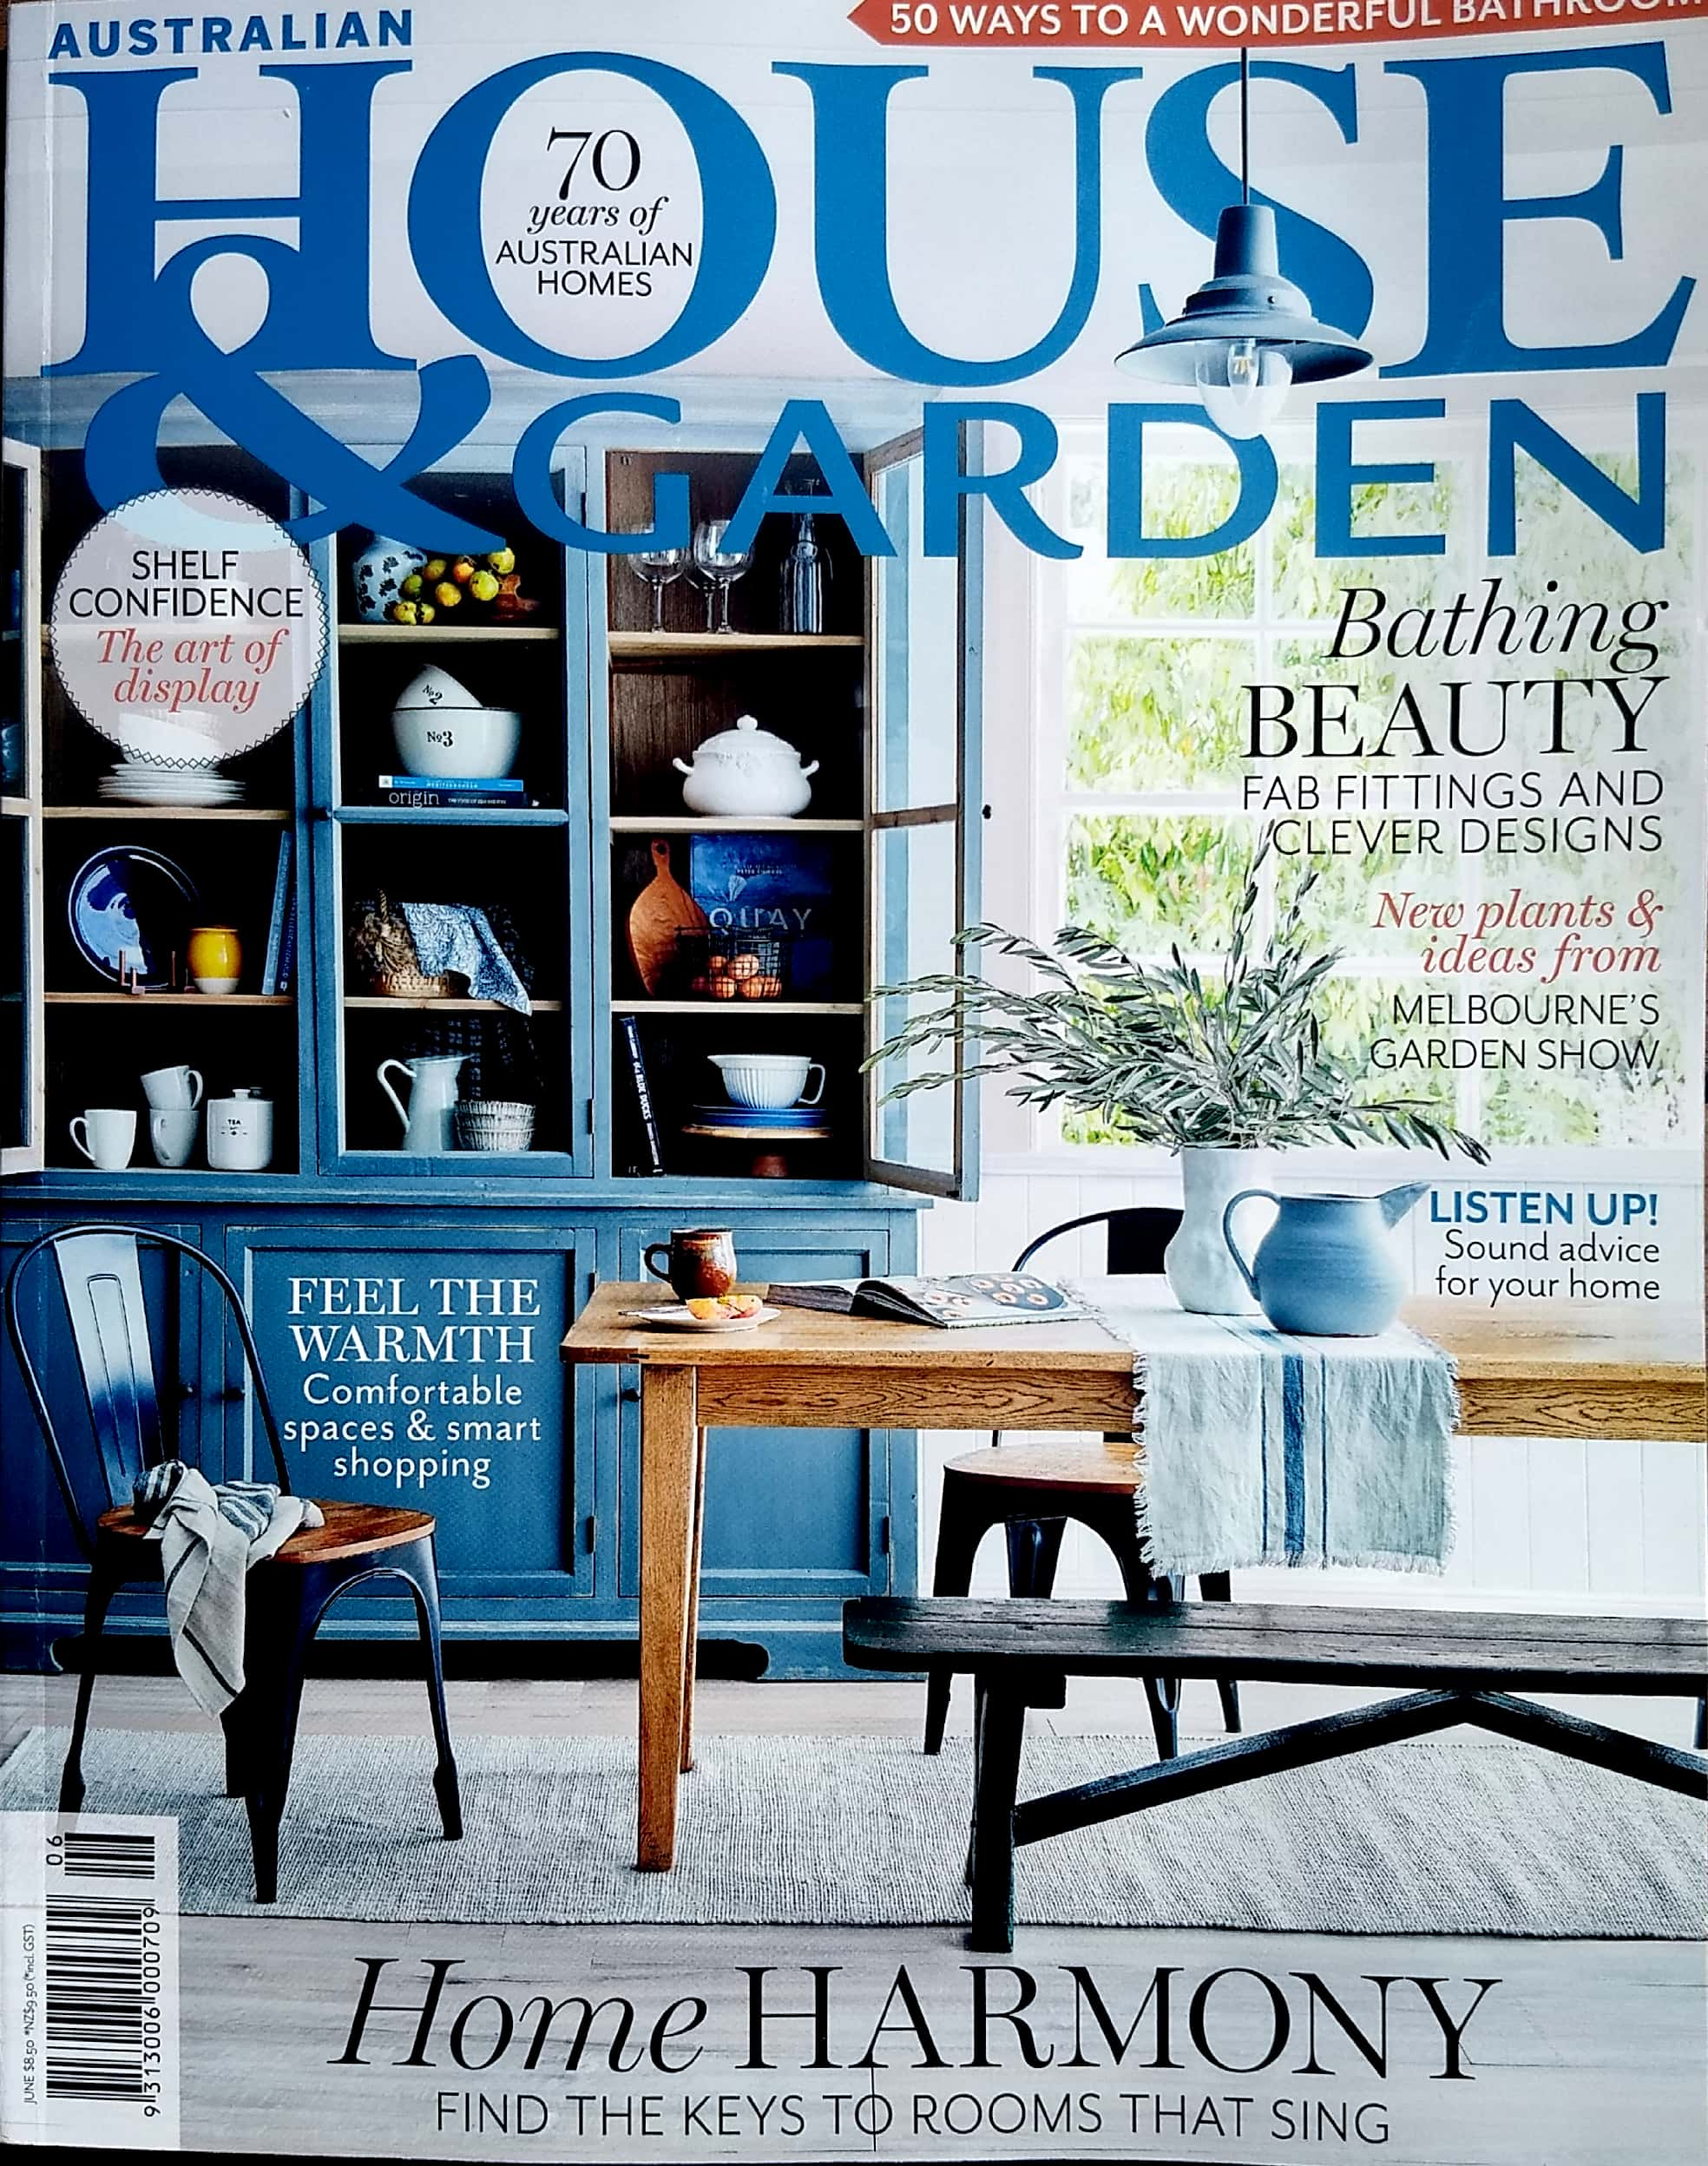 Article in House & Garden Magazine